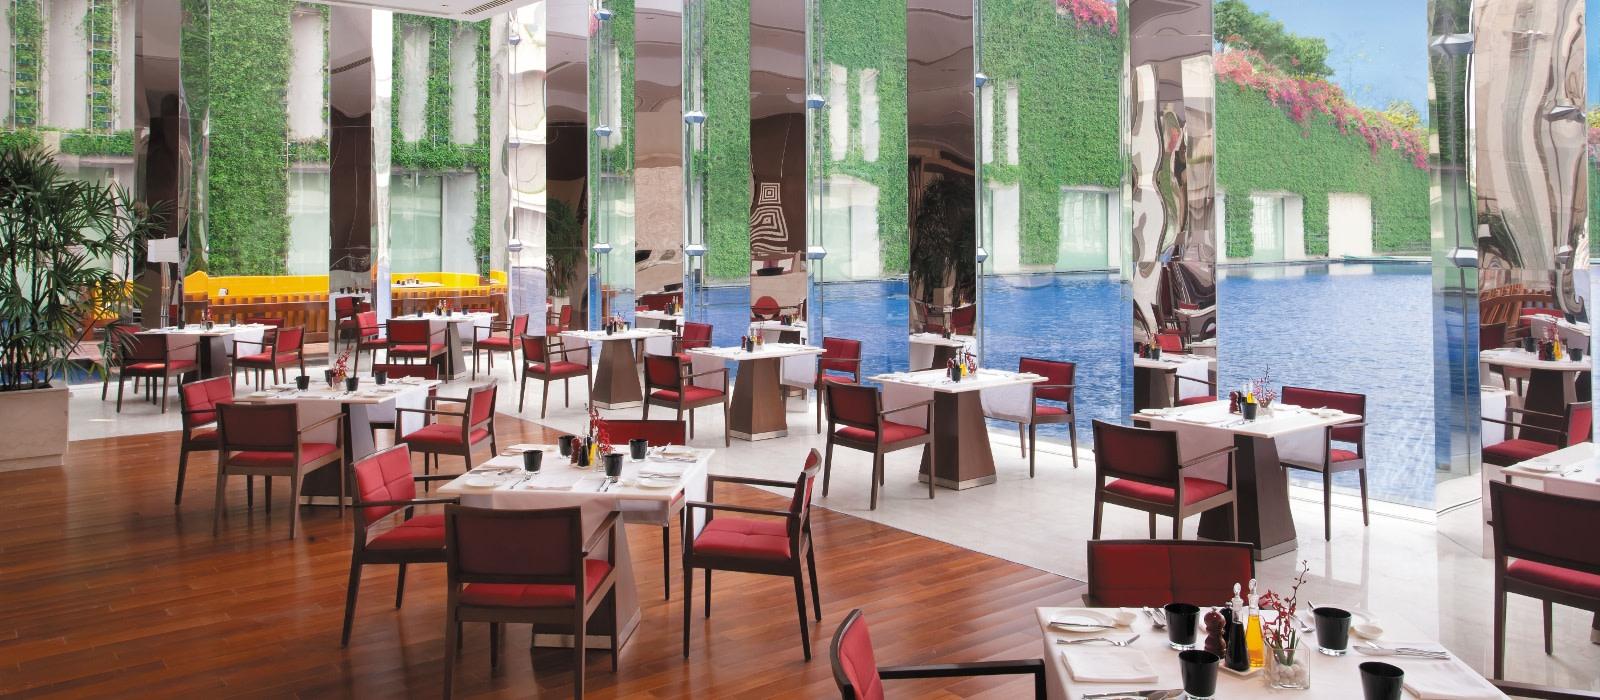 Hotel The Oberoi, Gurgaon Nordindien